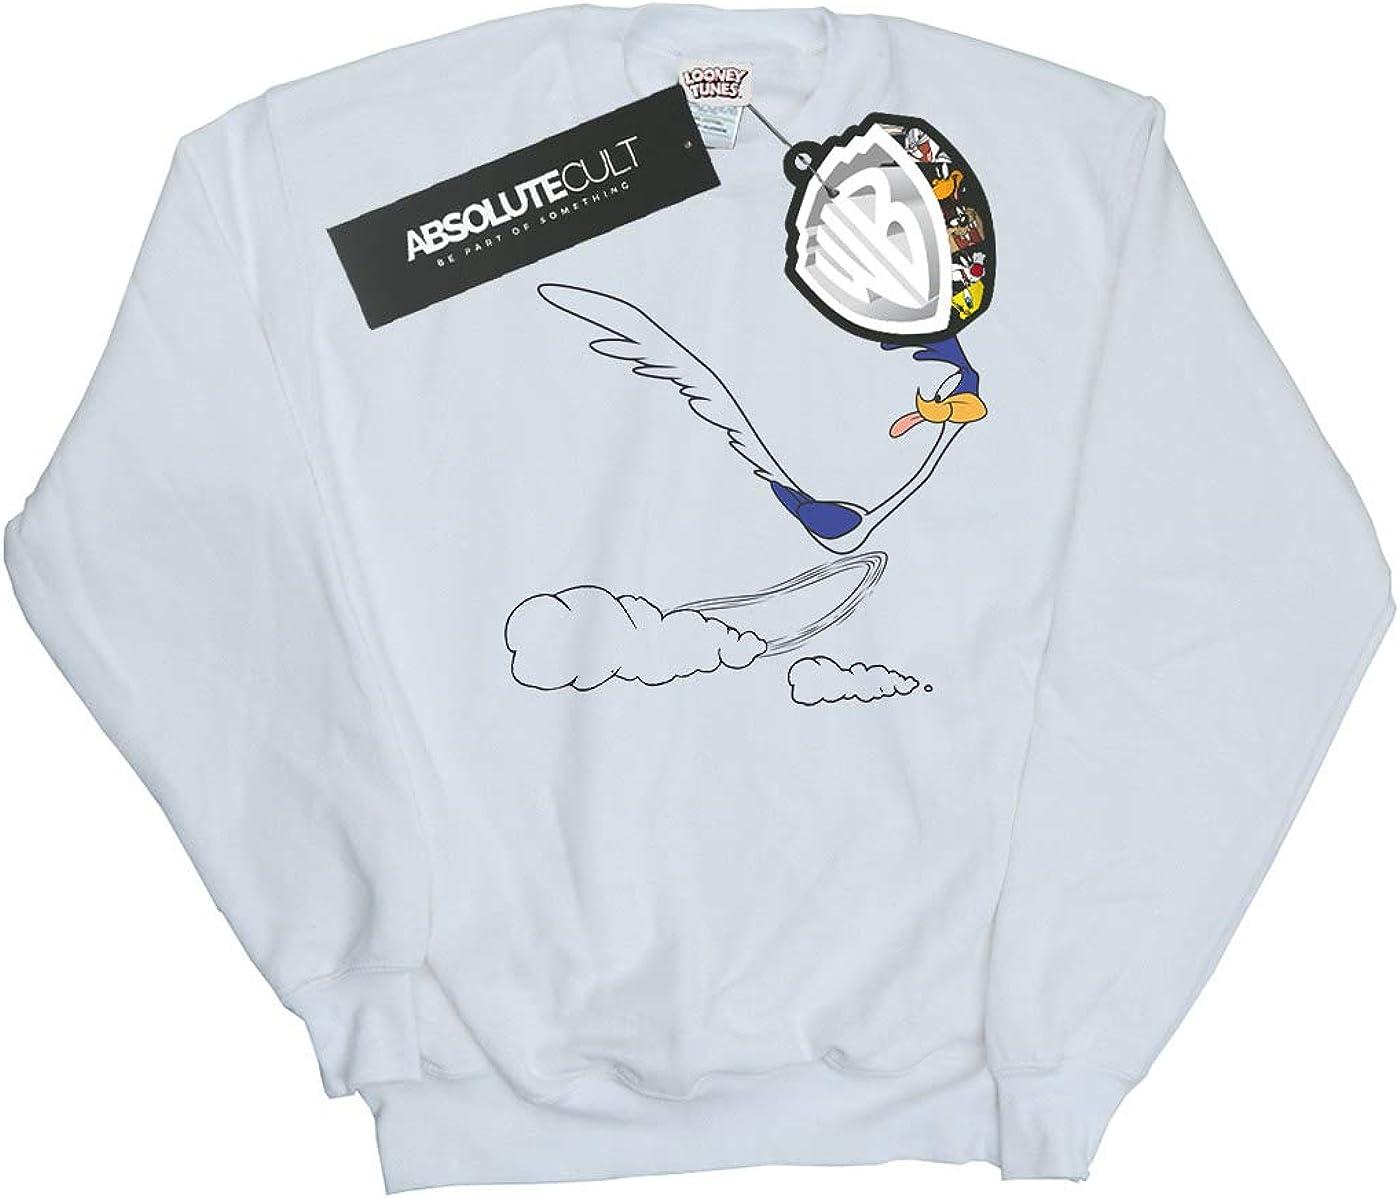 Absolute Cult Looney Tunes Girls Road Runner Running Sweatshirt